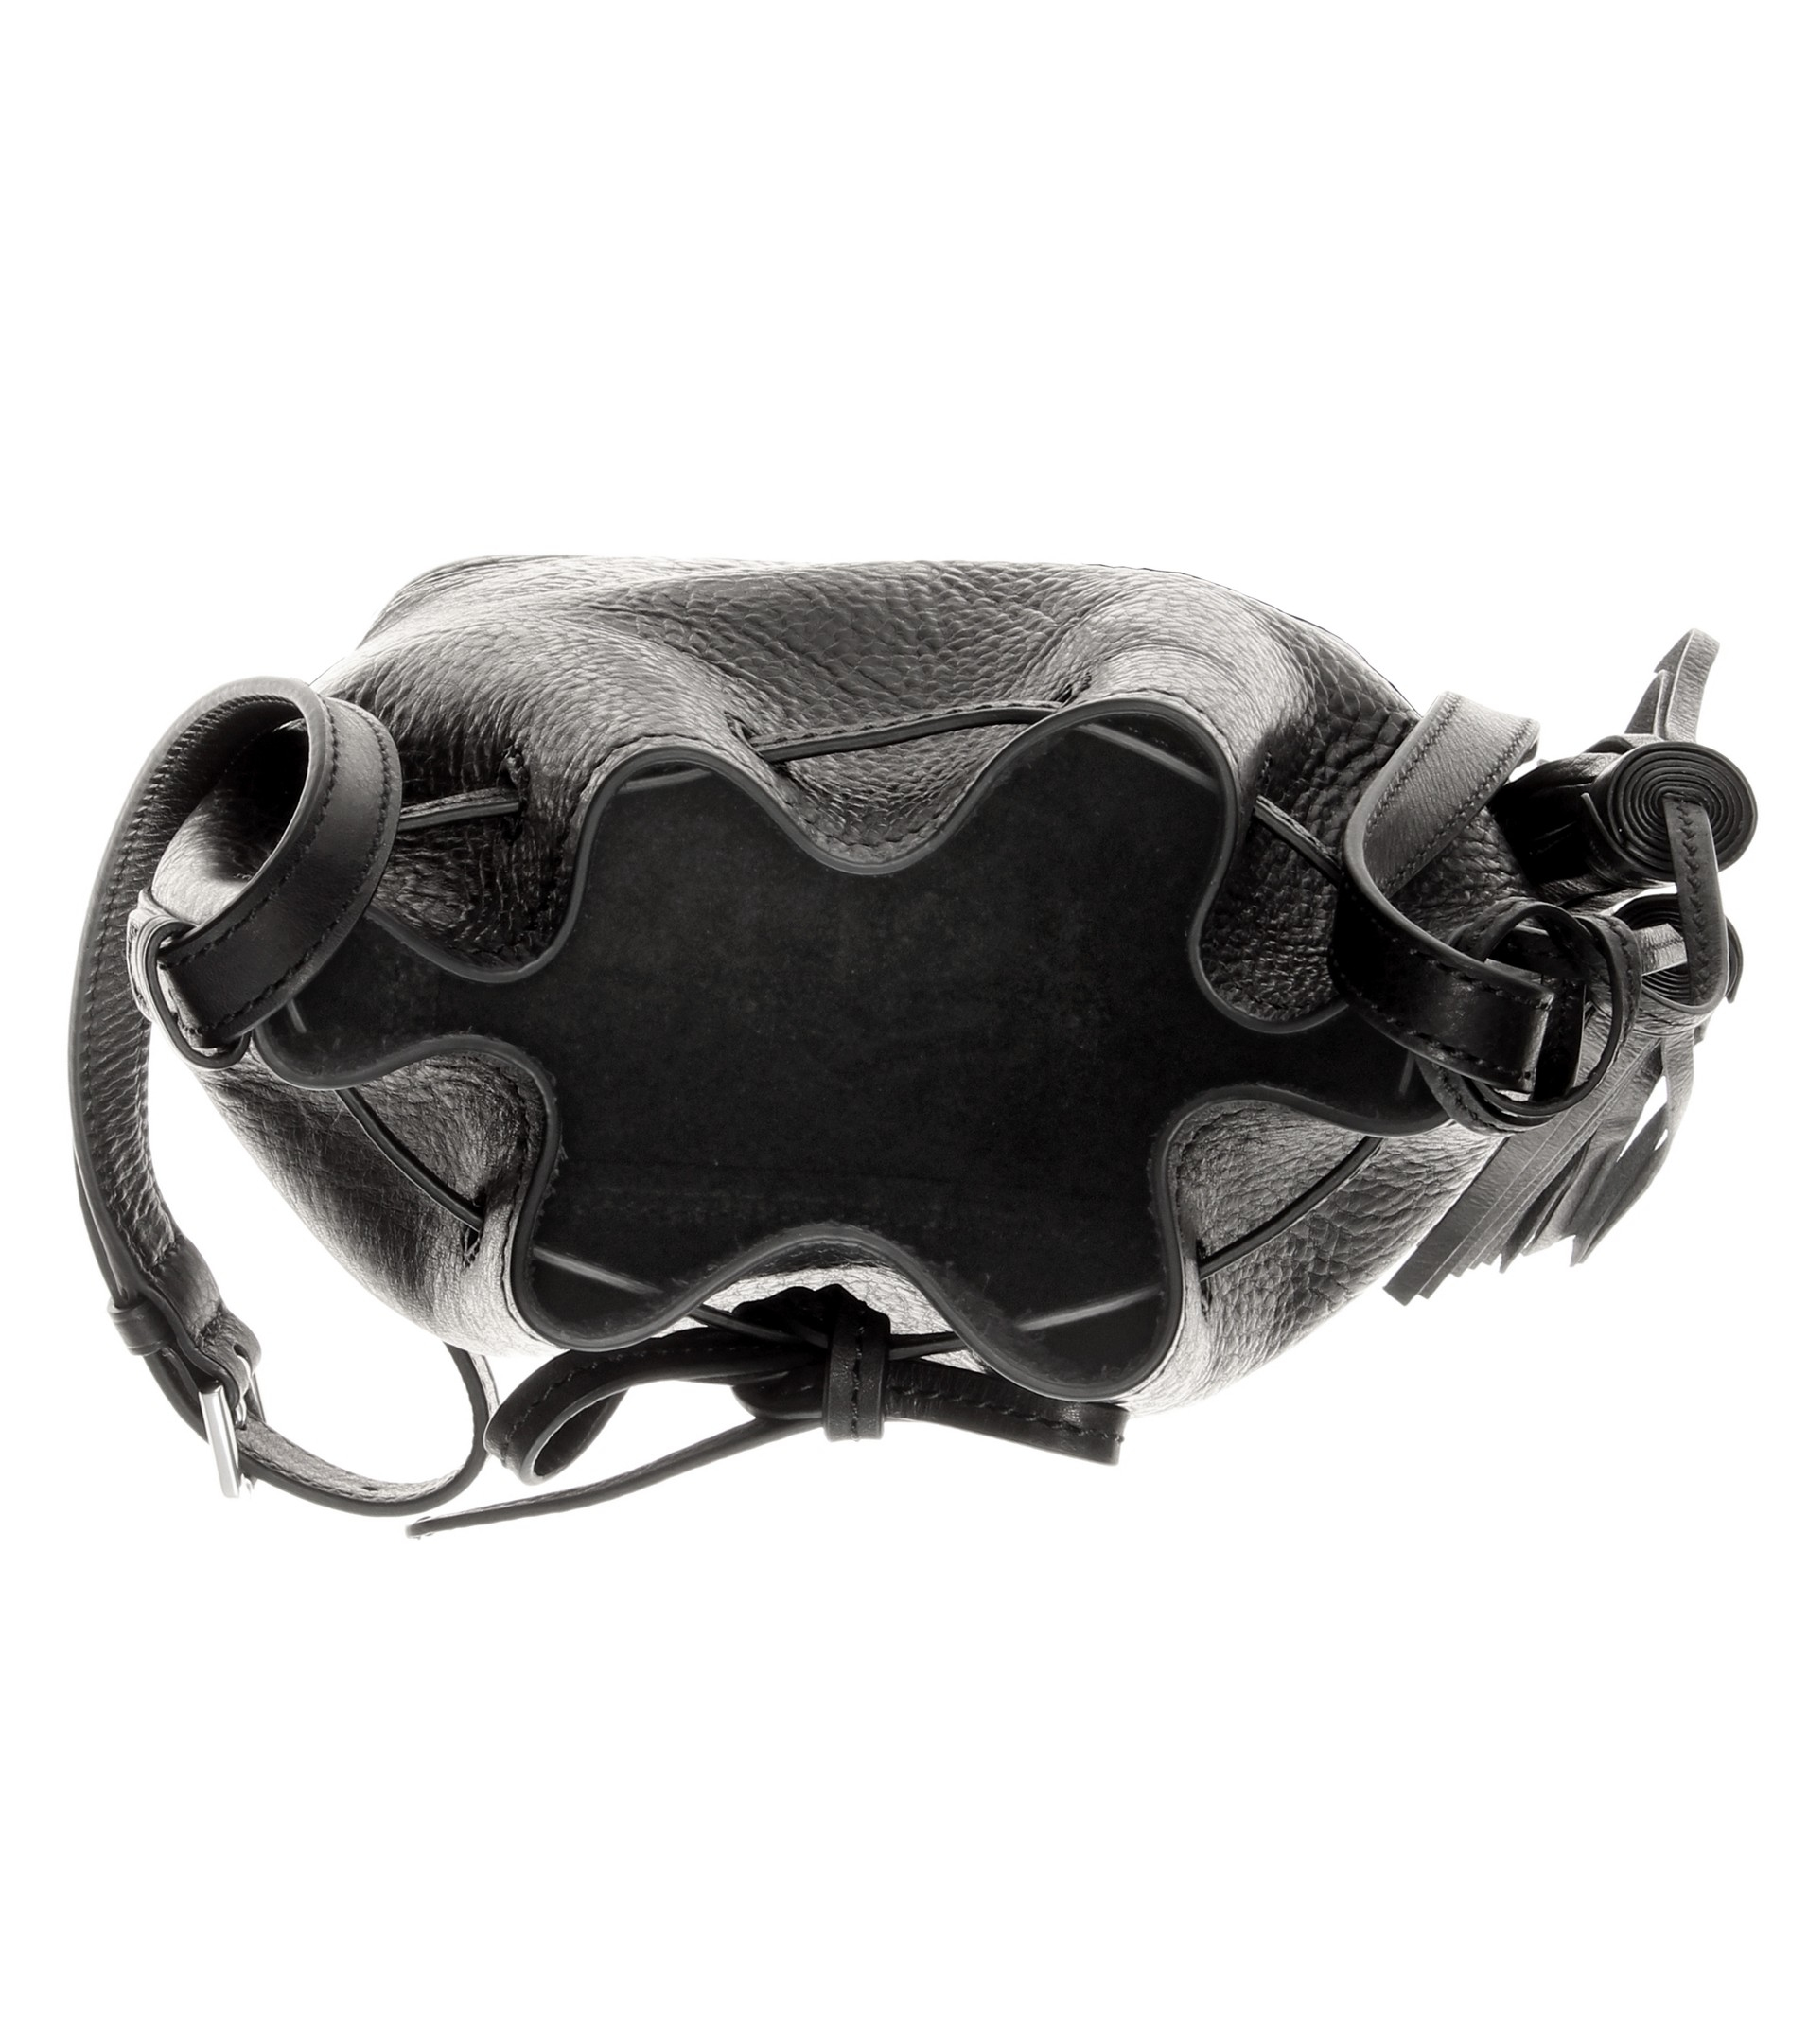 Polo ralph lauren Mini Bucket Leather Shoulder Bag in Black | Lyst. Ralph Lauren Polo Chic Canvas Handbag Red